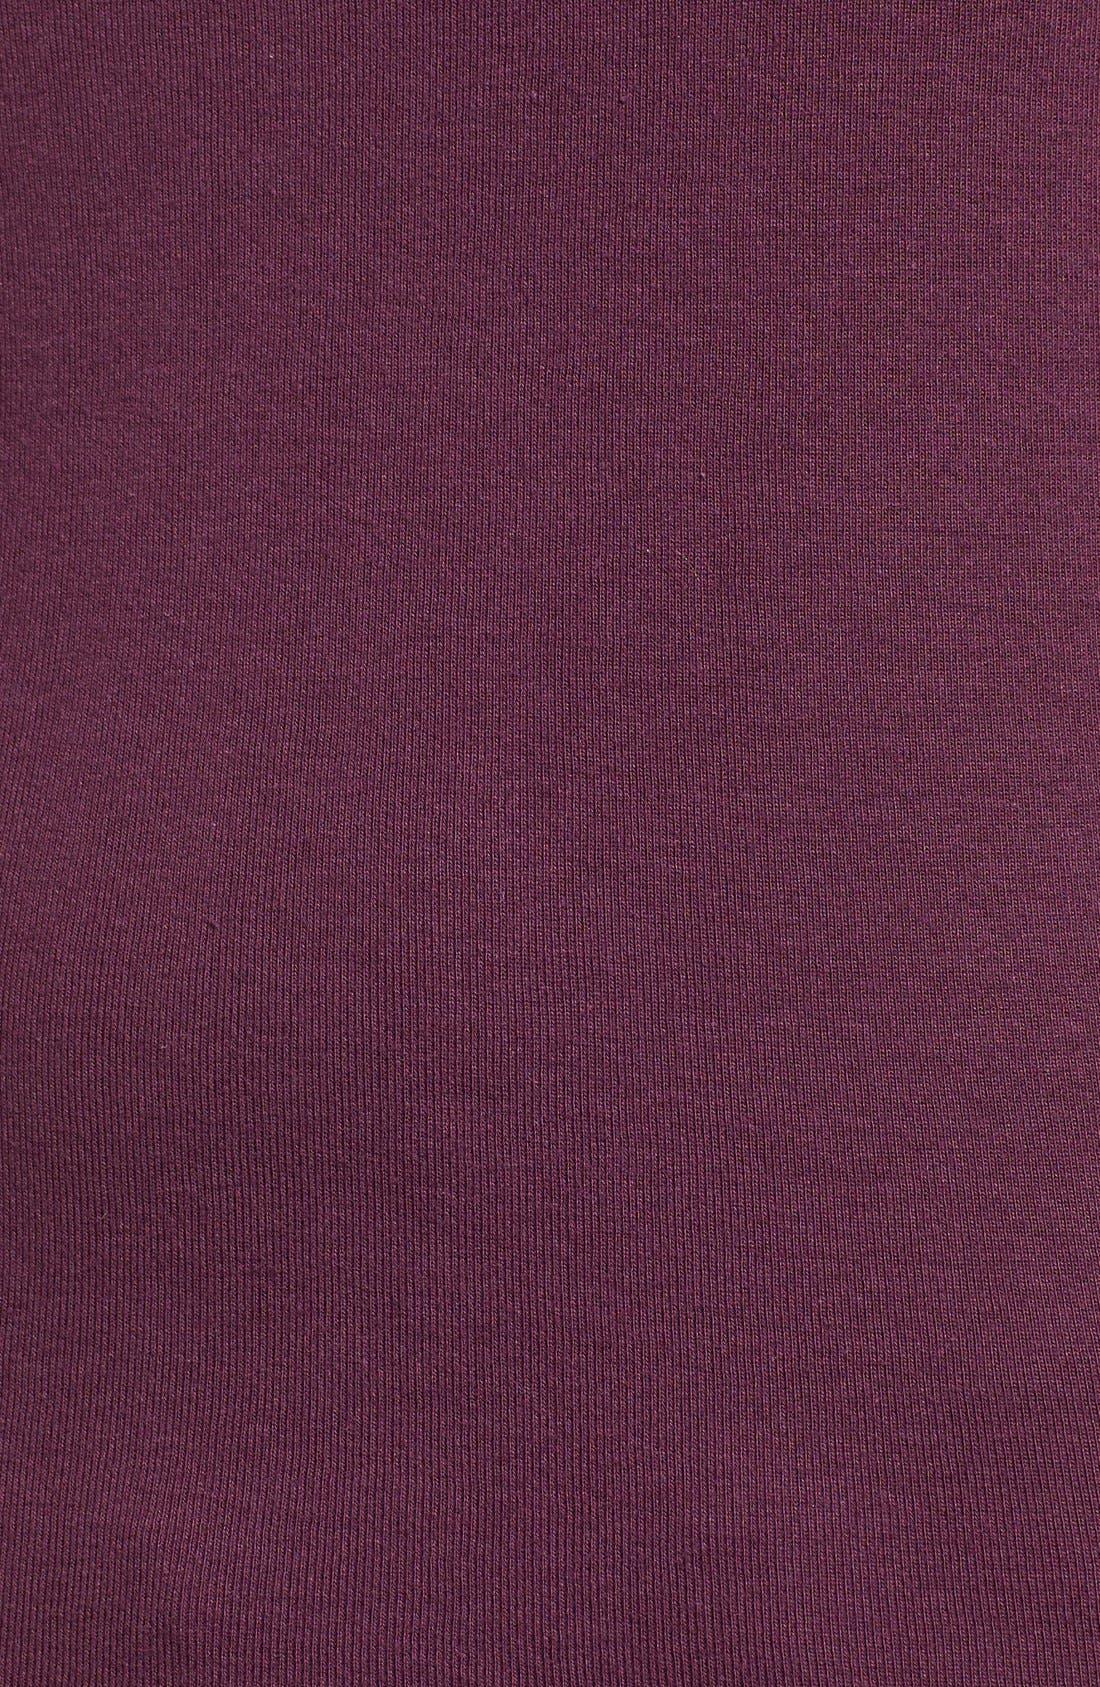 Ballet Neck Cotton & Modal Knit Elbow Sleeve Tee,                             Alternate thumbnail 198, color,